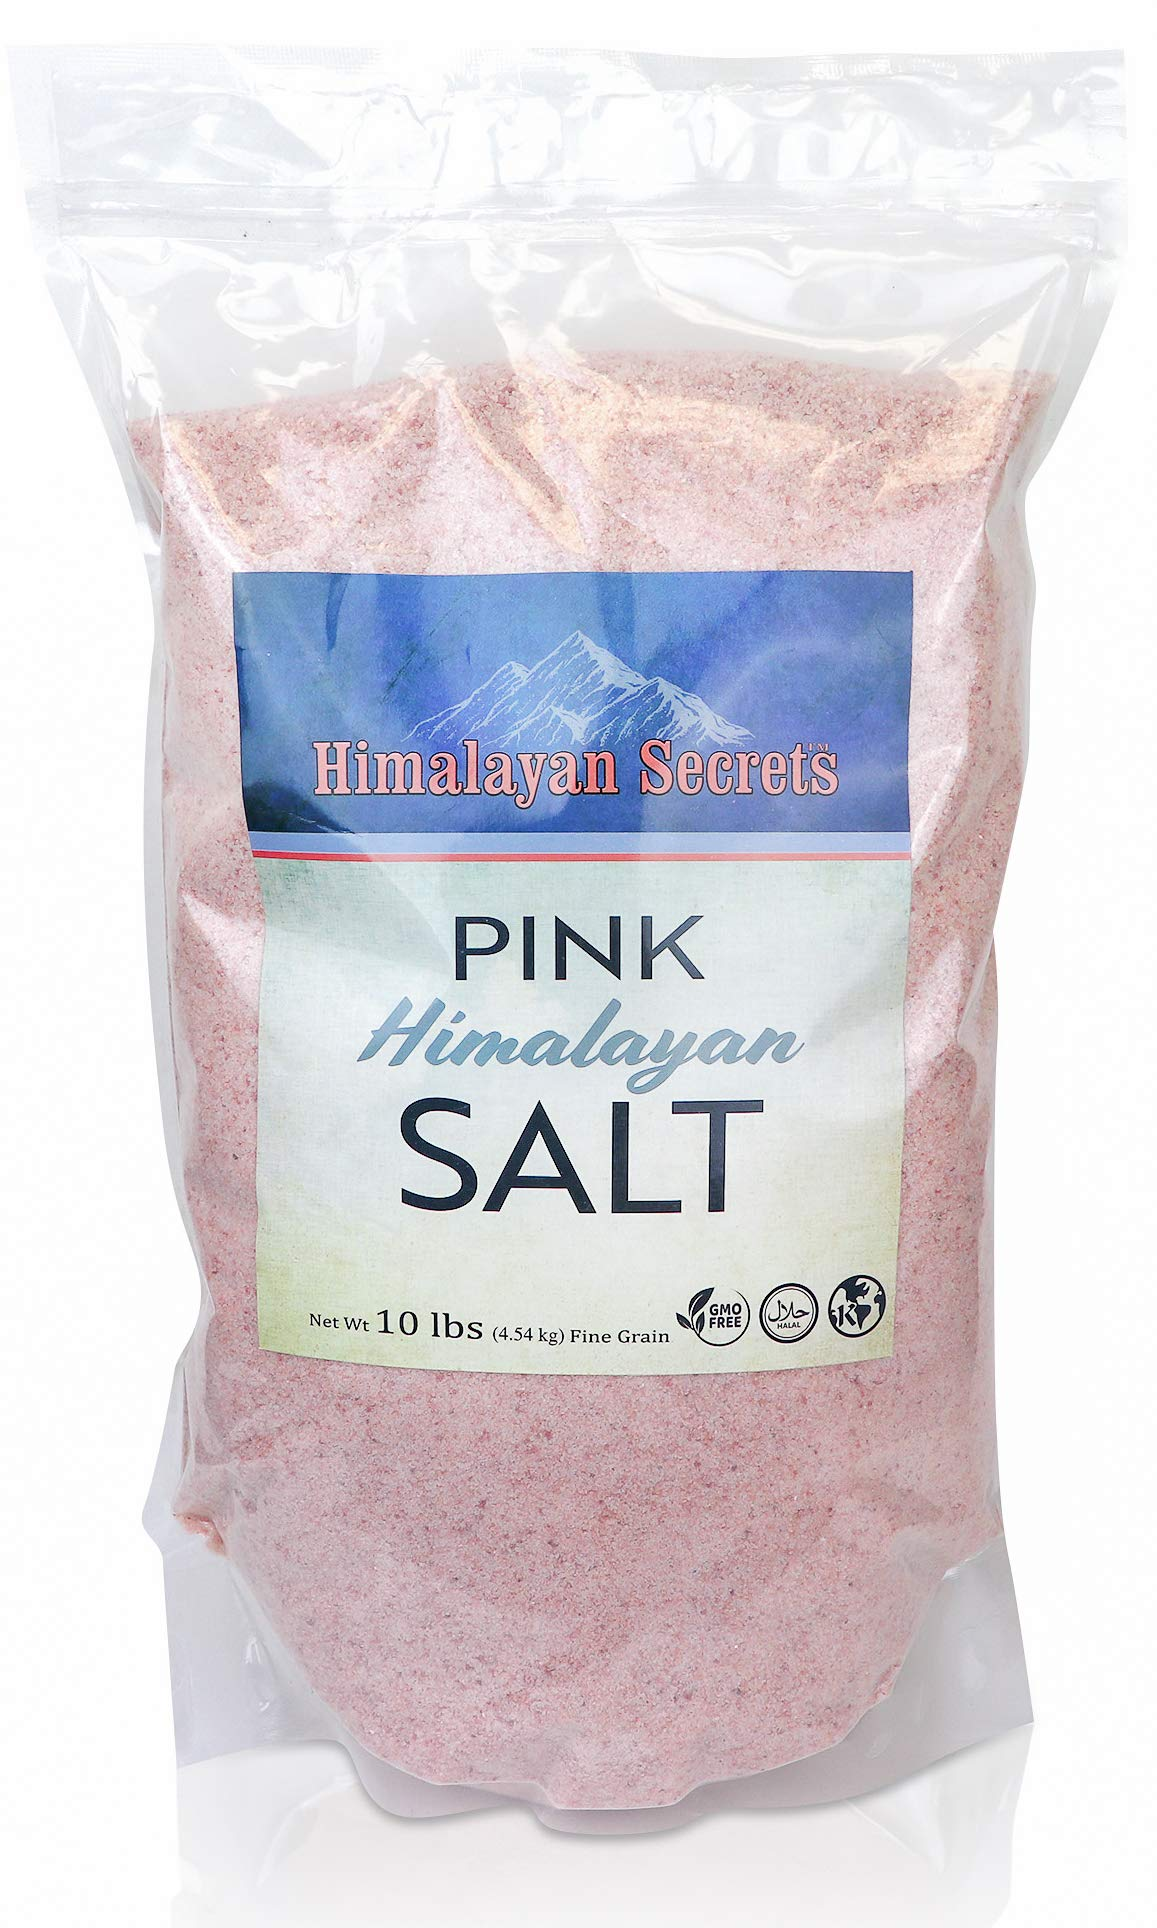 Himalayan Secrets Pink Rock Salt - 10LB - Coarse, Fine, Powder Grain Bulk Size - 100% Natural & Unrefined (Fine (0.3-0.5mm))